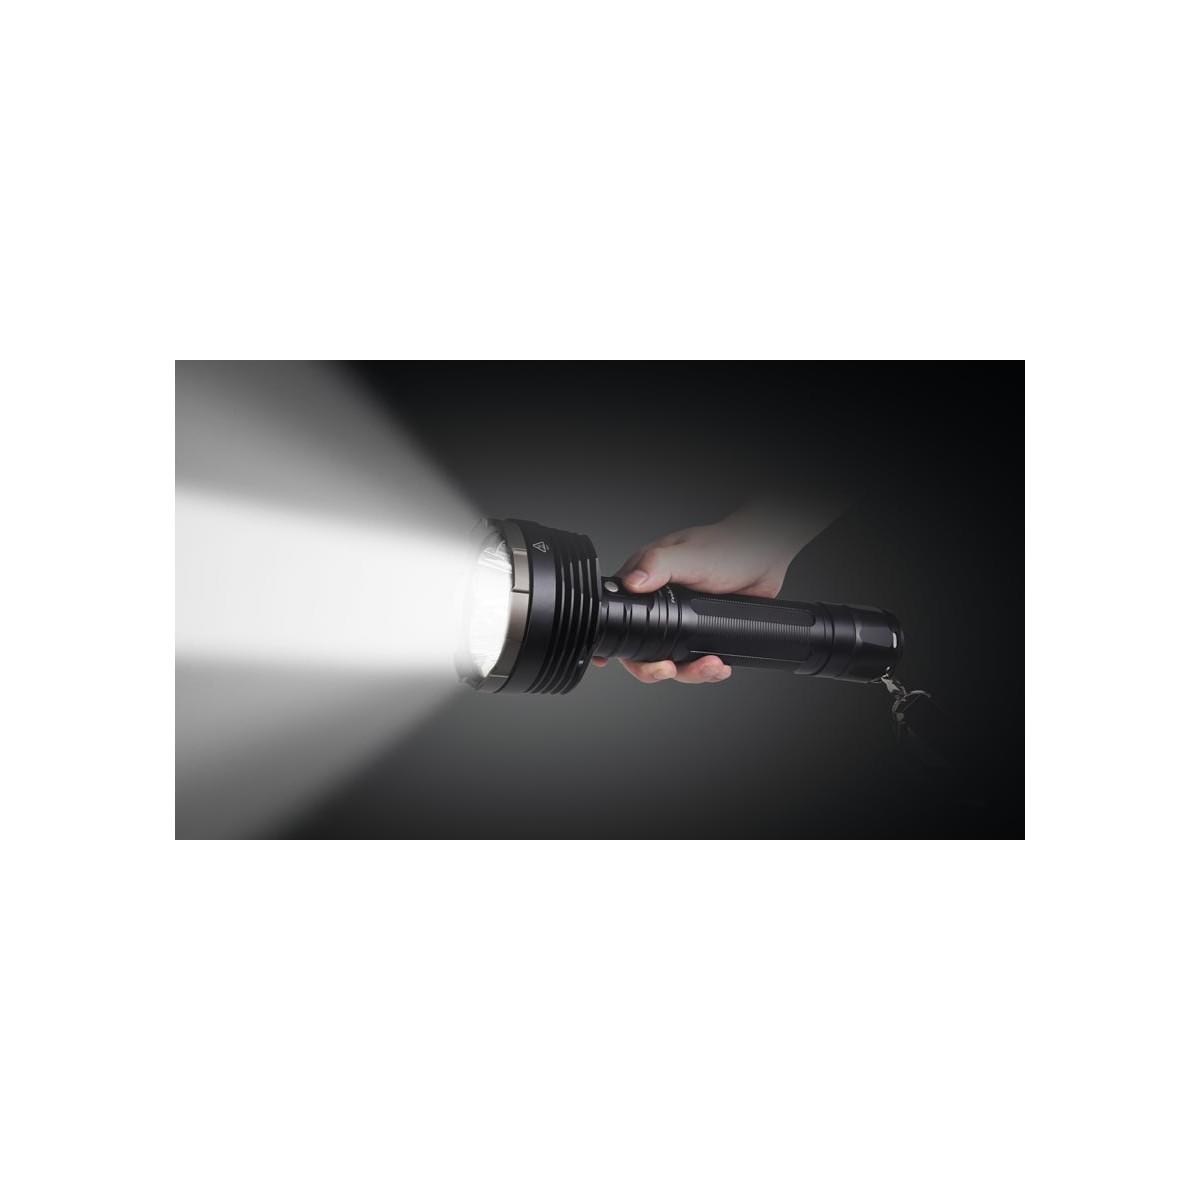 Lumens Led 6000 Lampe Torche Rechargeable CxoeWQrdB